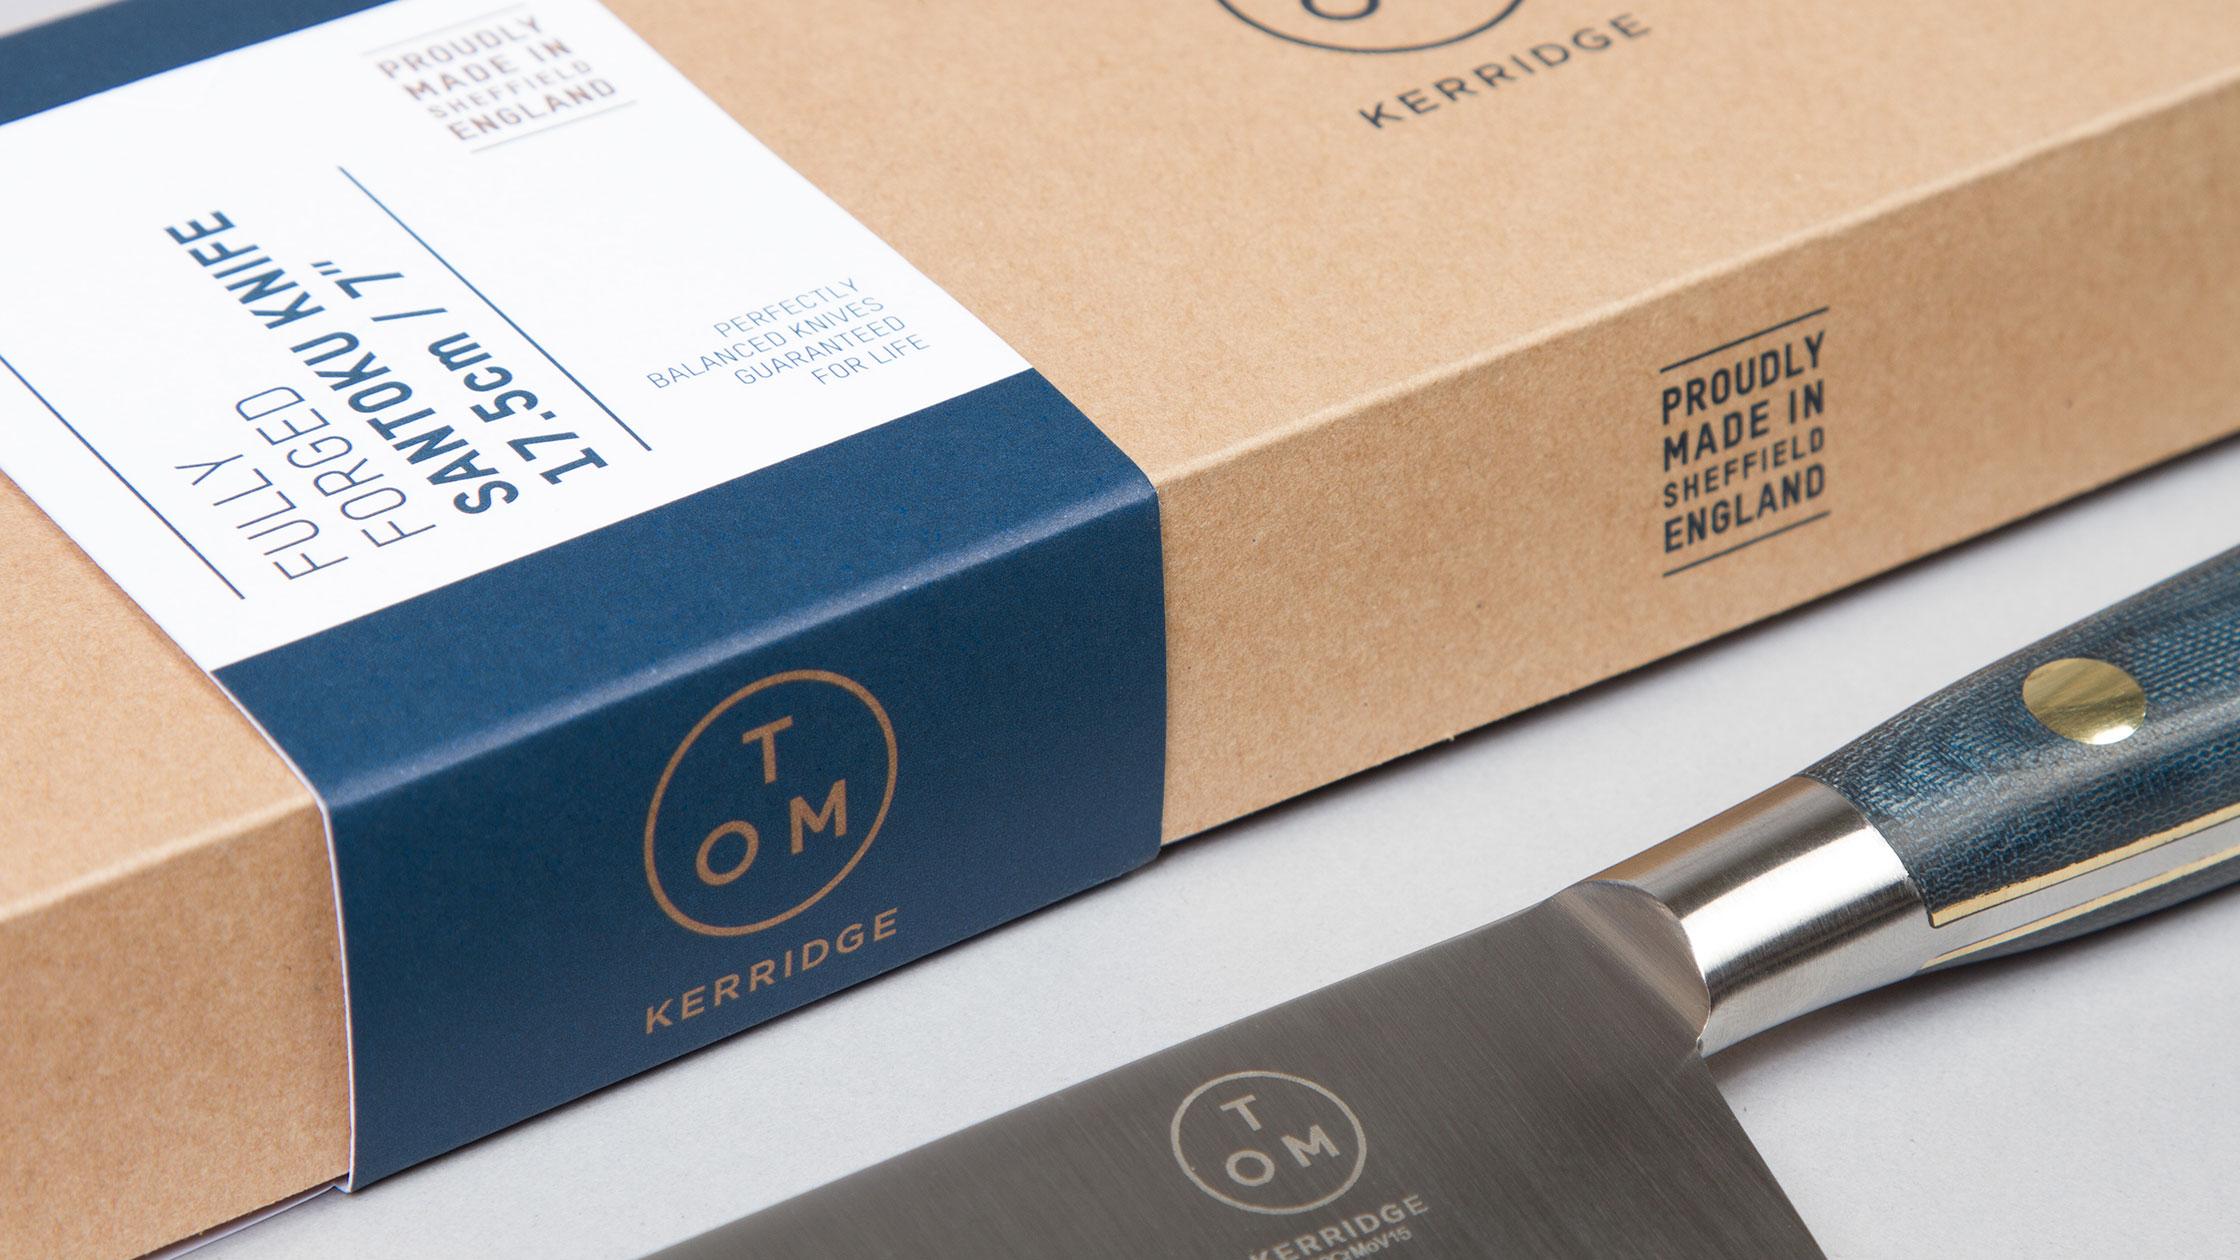 Tom_K Knives packaging close up